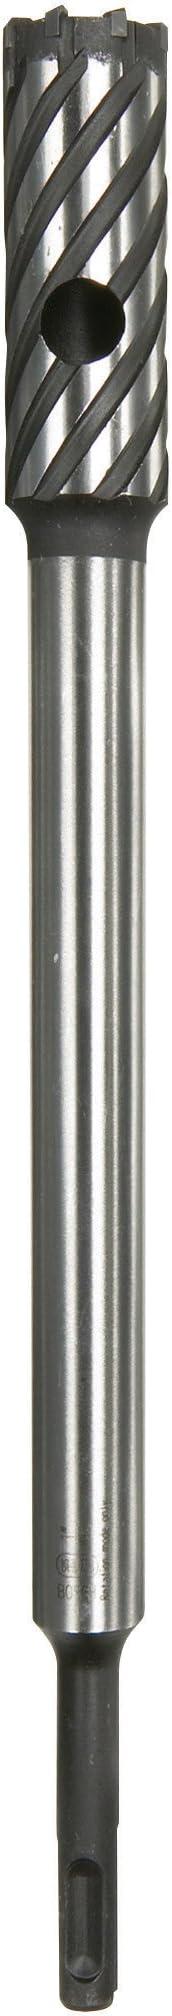 Bosch Rebar Cutter Vierschneider SDS-Plus-9 18 x 120 x